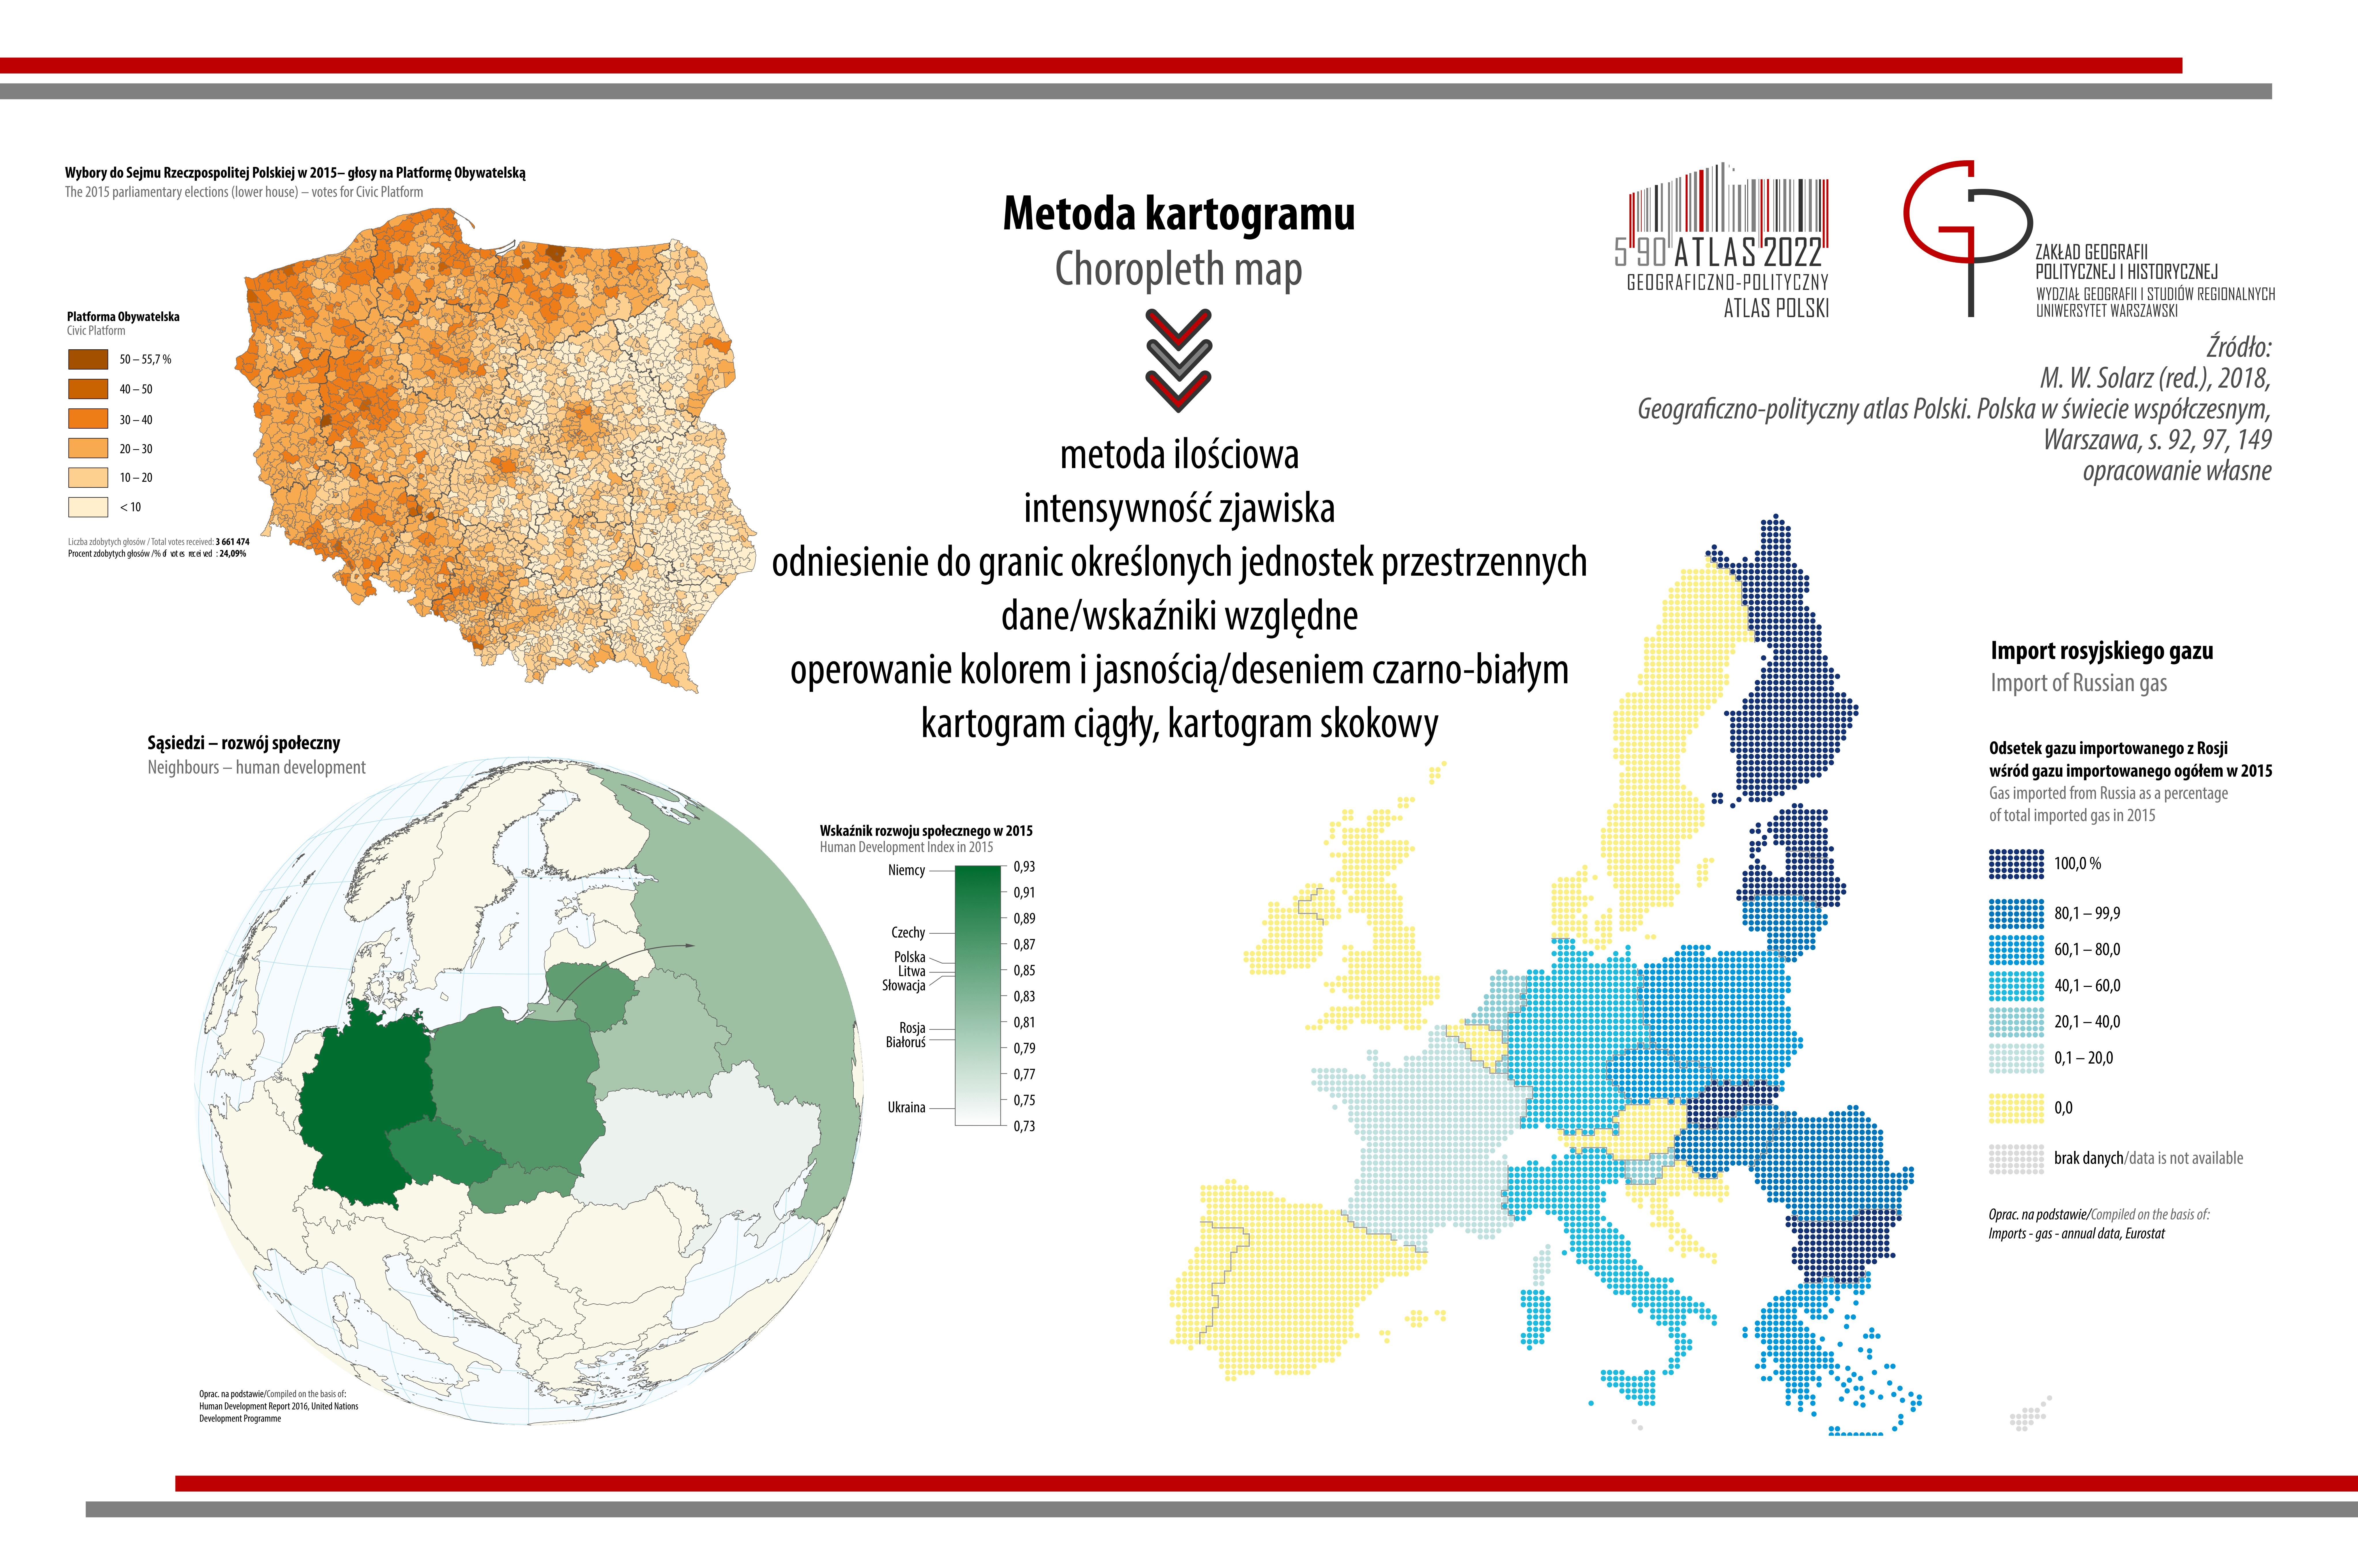 POST KARTOGRAFICZNY: metoda kartogramu